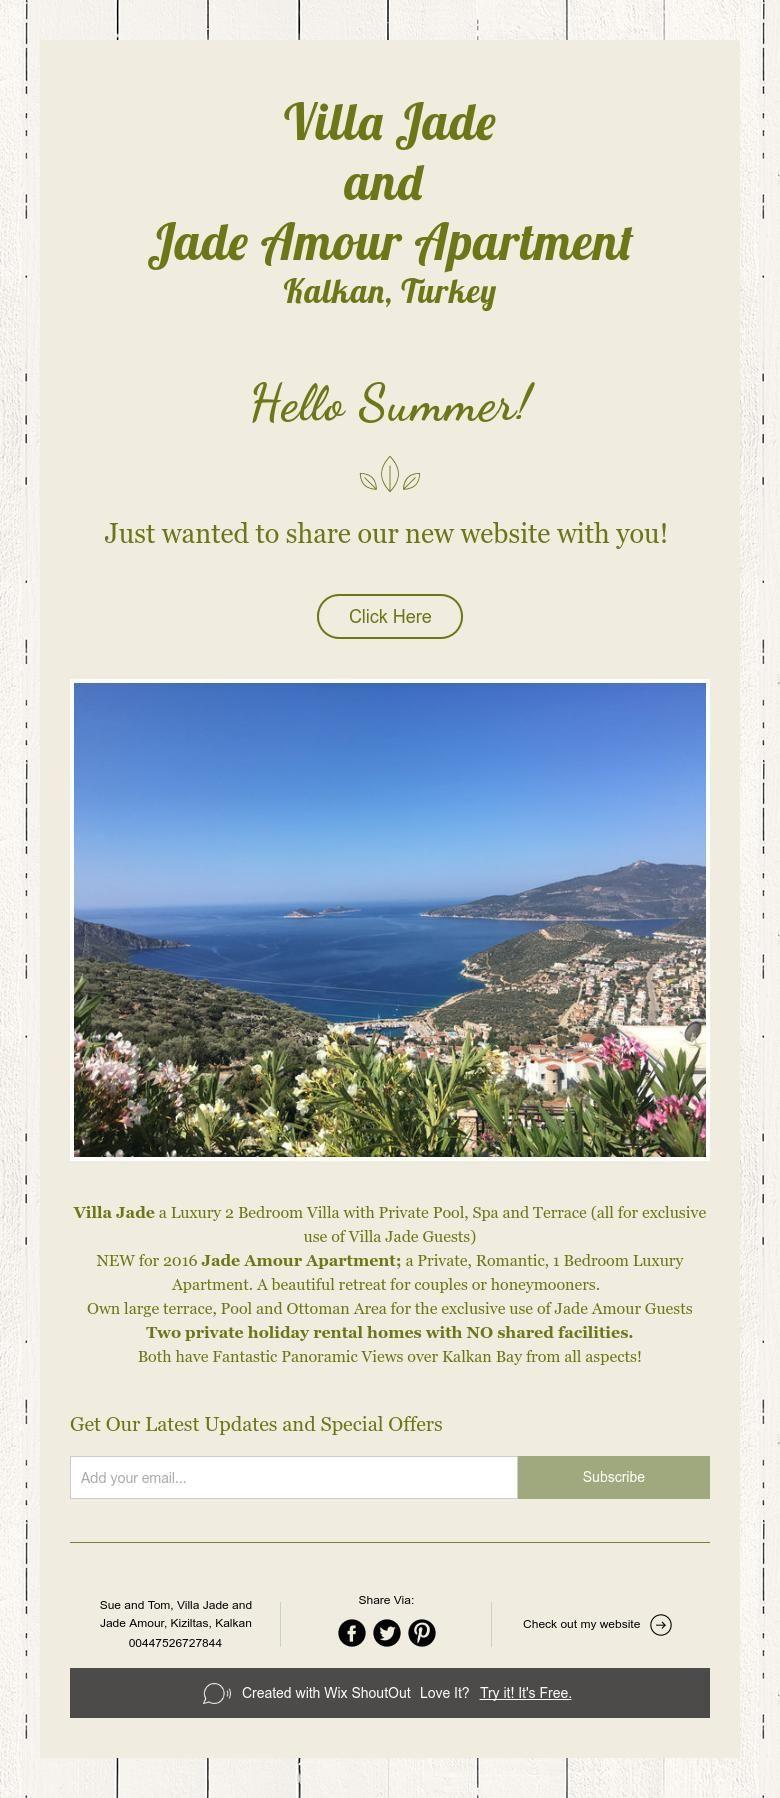 Villa Jade And Jade Amour Apartment Kalkan, Turkey Hello Summer!